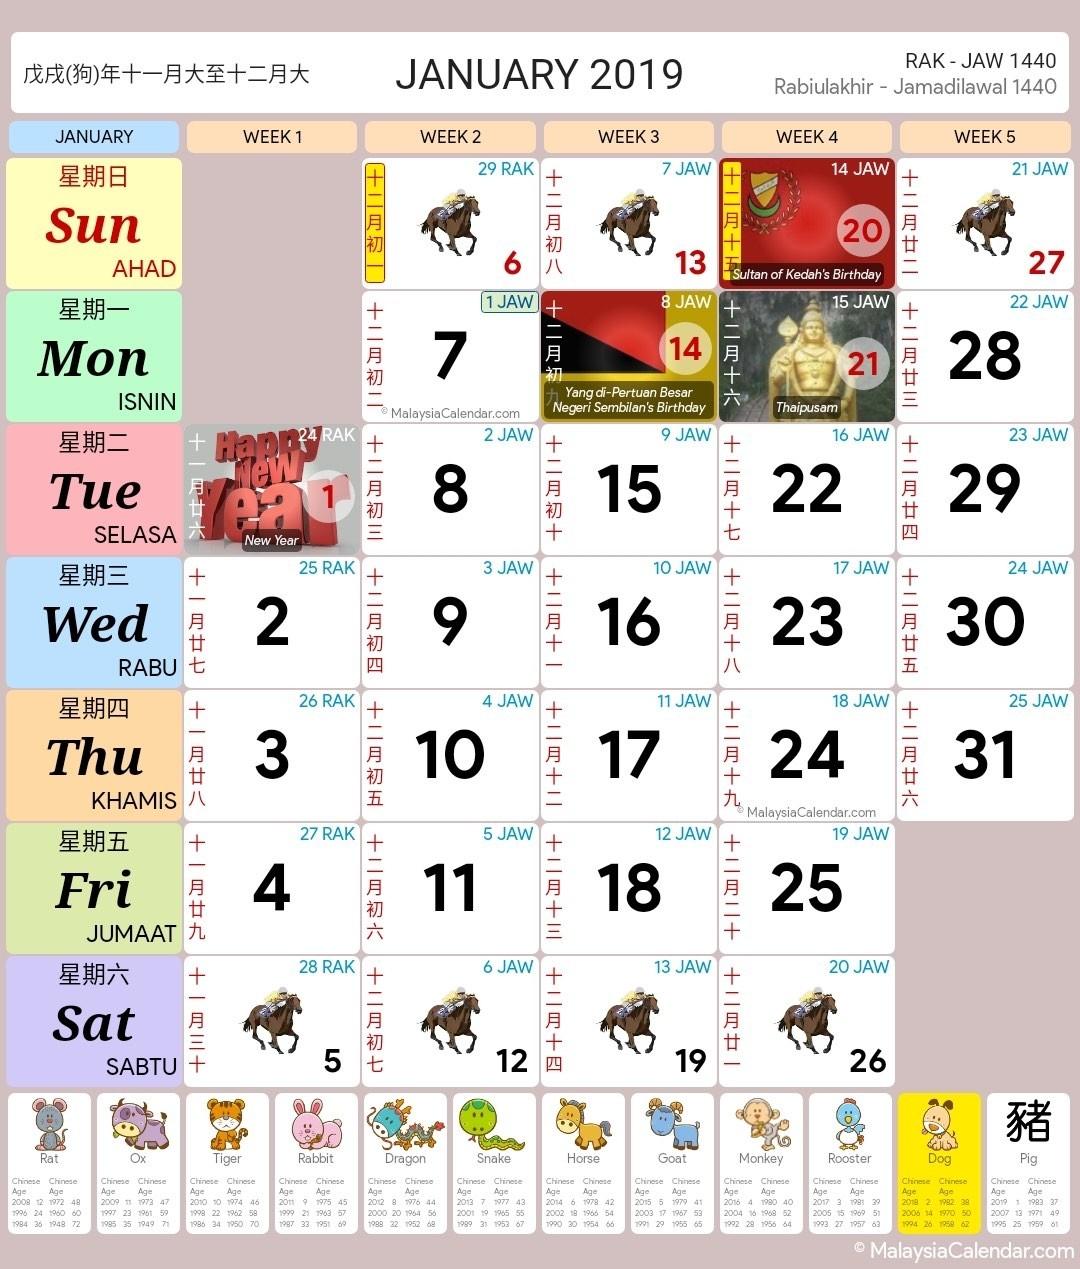 Malaysia Calendar Year 2019 (School Holiday) - Malaysia Calendar-School Holidays 2020 Malaysia